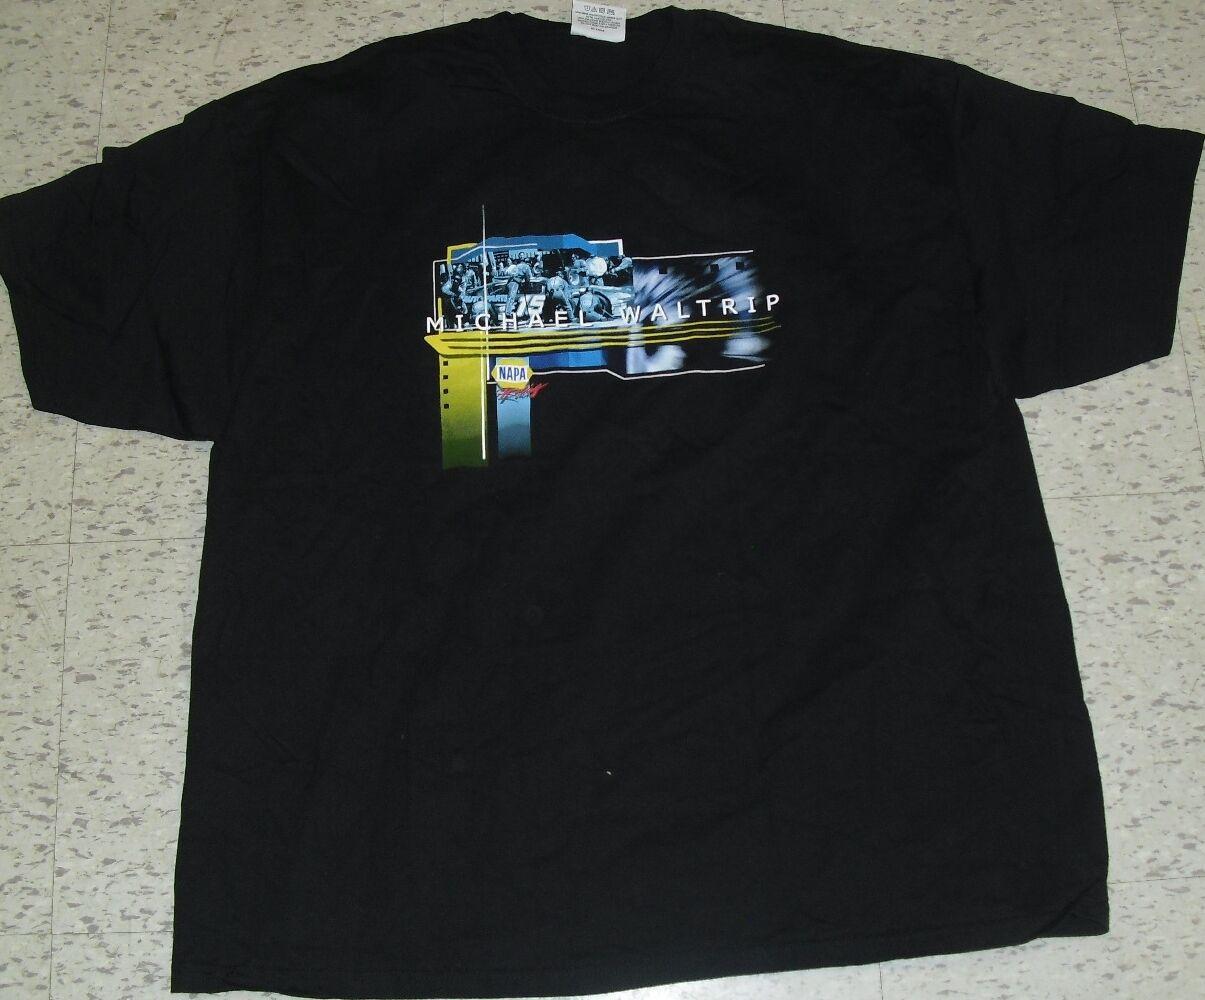 Michael Waltrip Nascar Racing NEW2 T-Shirt sz.2X XXL BRAND NEW2 Racing SIDED PRINTS 5e19b7